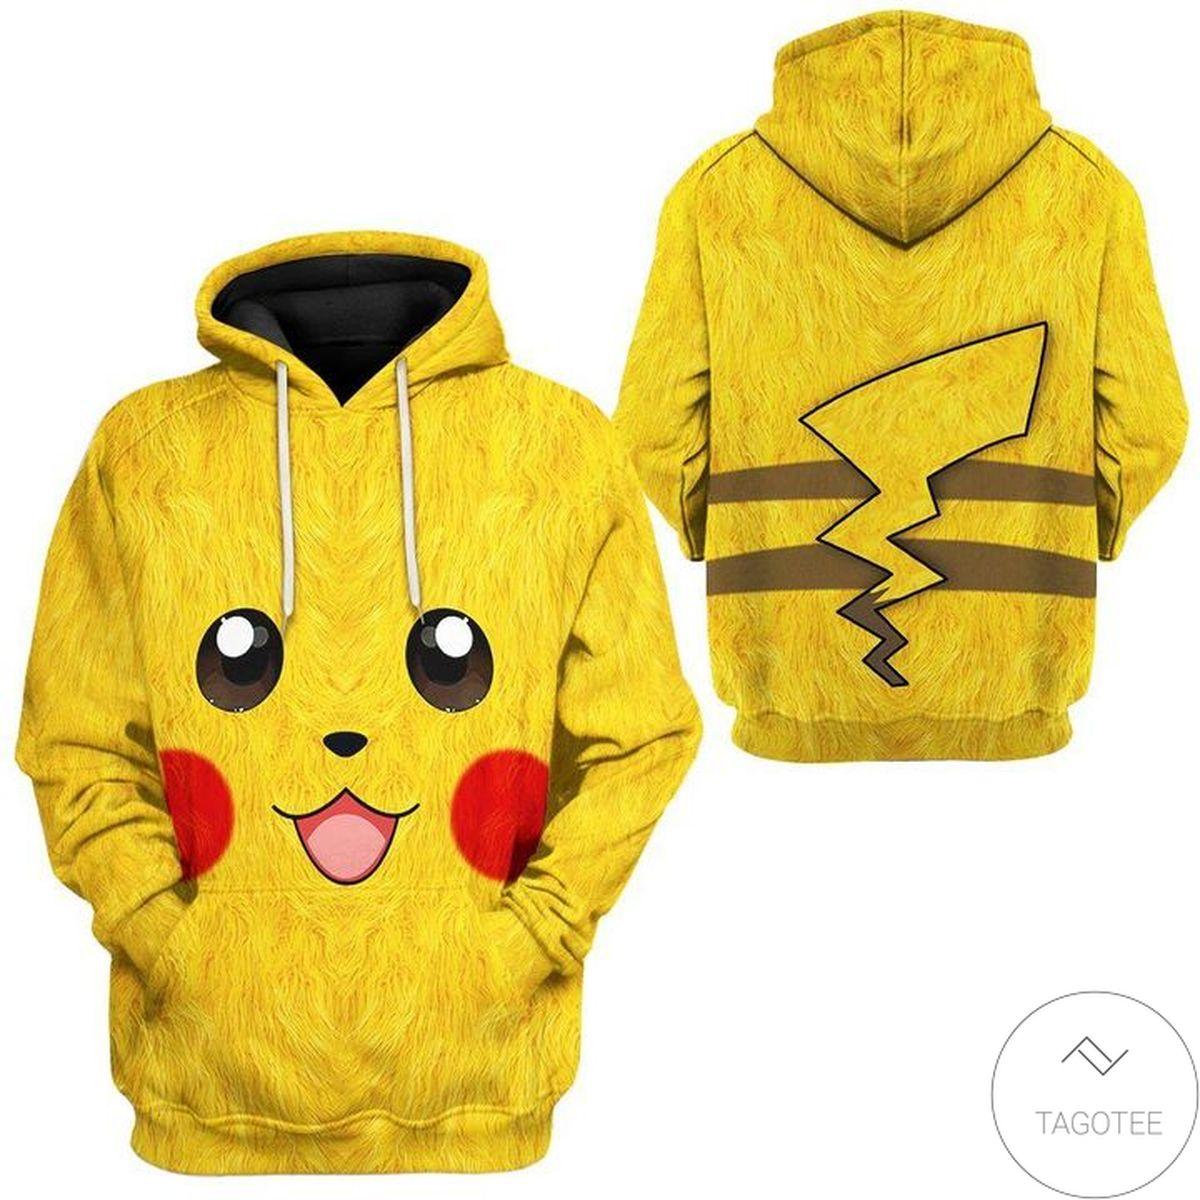 Pokemon Pikachu 3d Hoodie